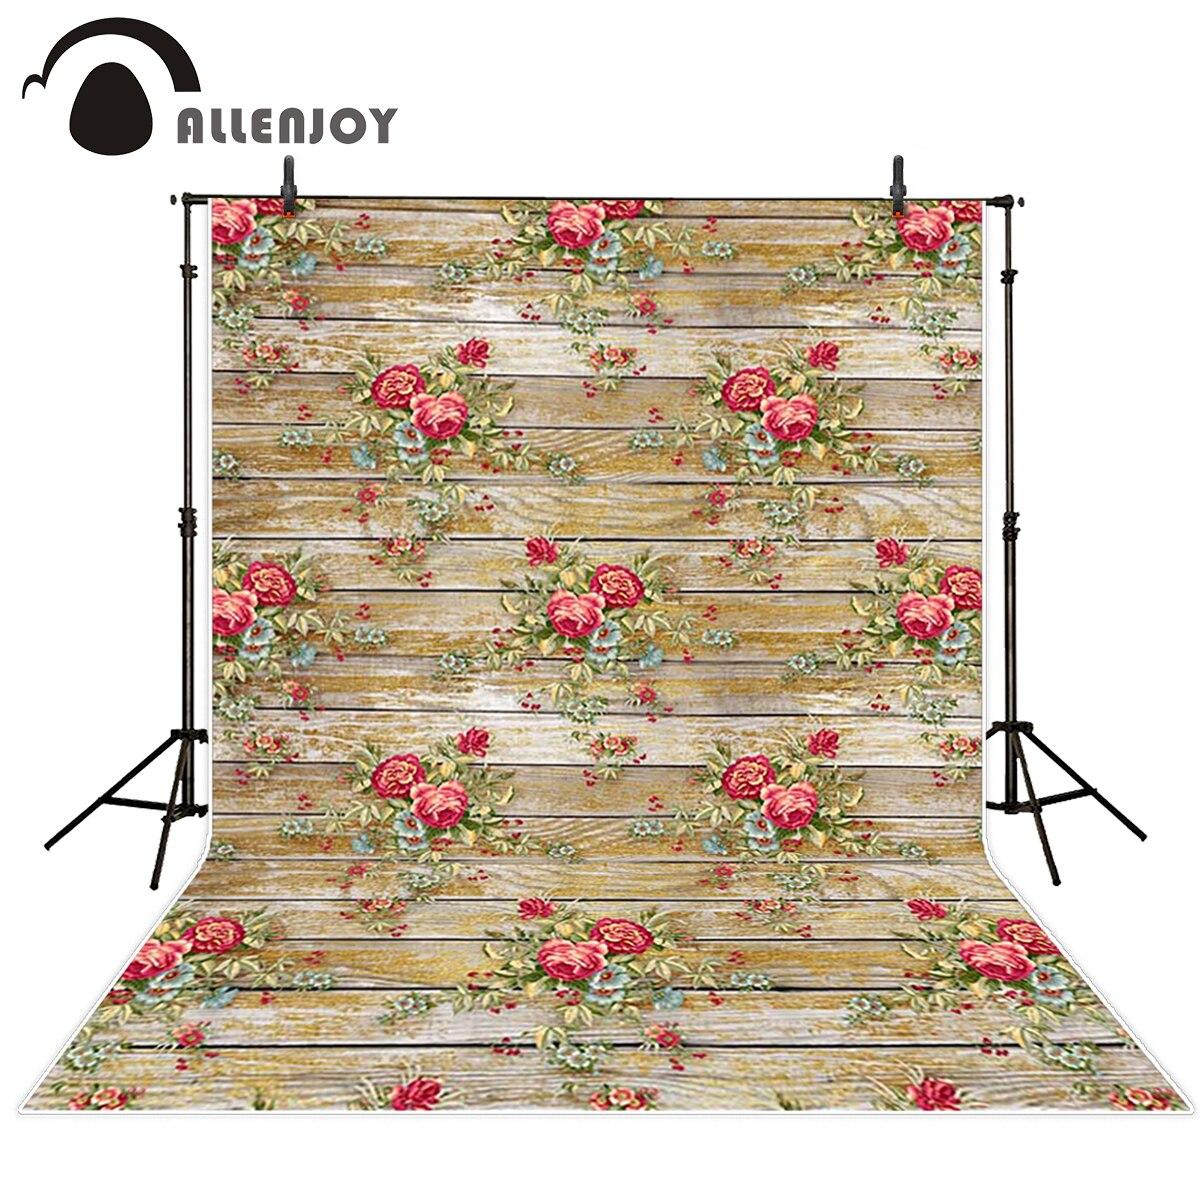 Allenjoy wood background Beautiful rose printing on wood board background vinyl photo background photography backdrop photocall